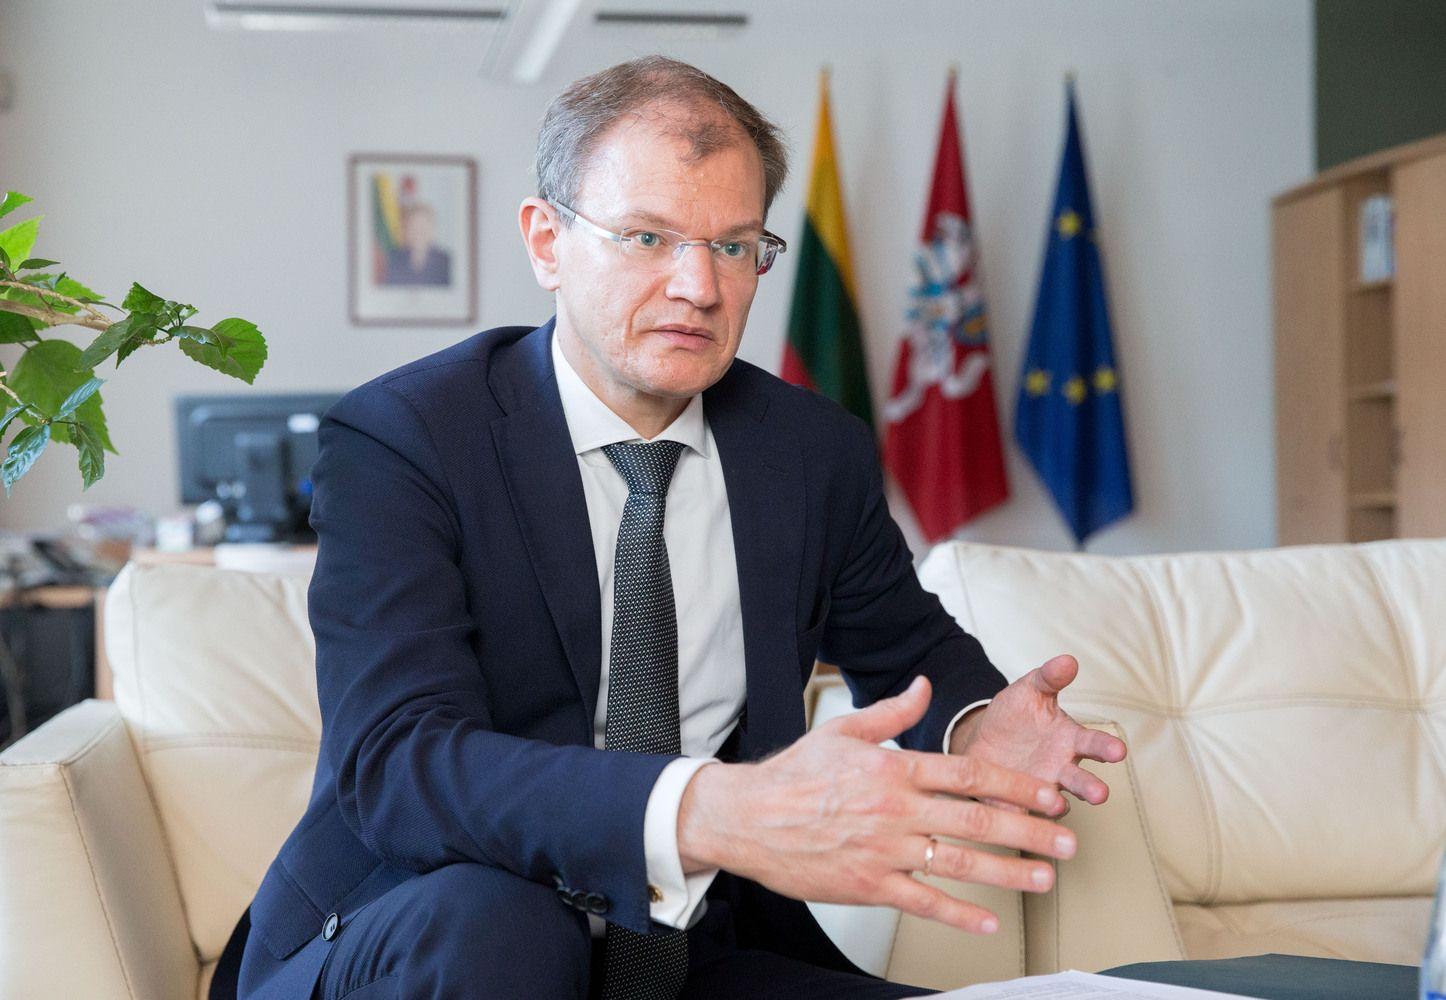 """Per mažai ir per vėlai"": Lietuvos žemdirbiai 2027 m. gautų 80% ES vidurkio"